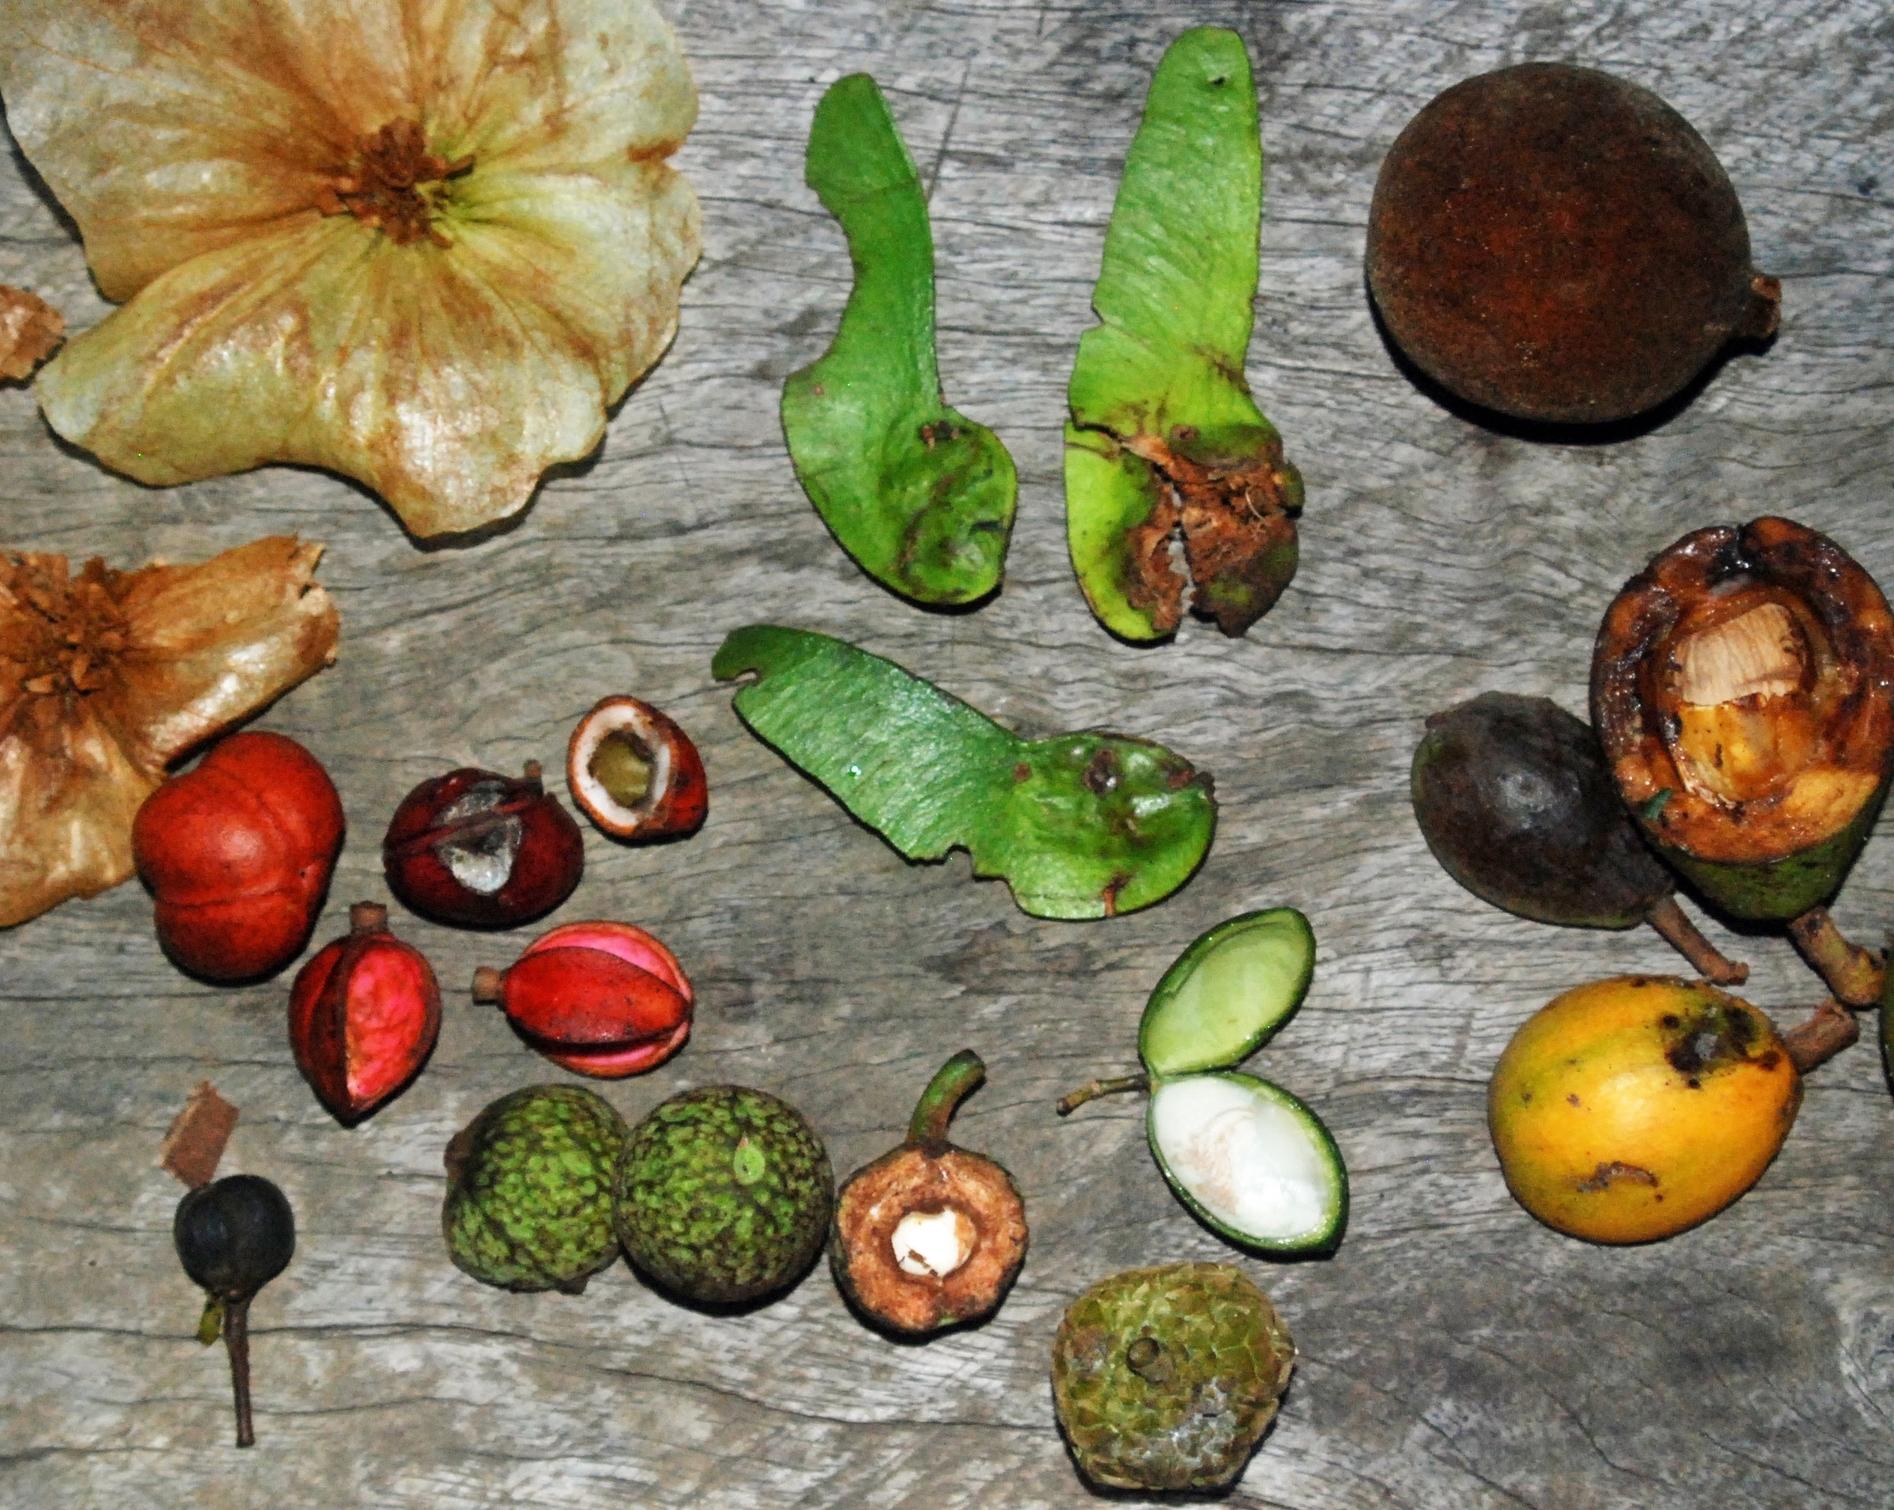 Misc Fruits.jpg